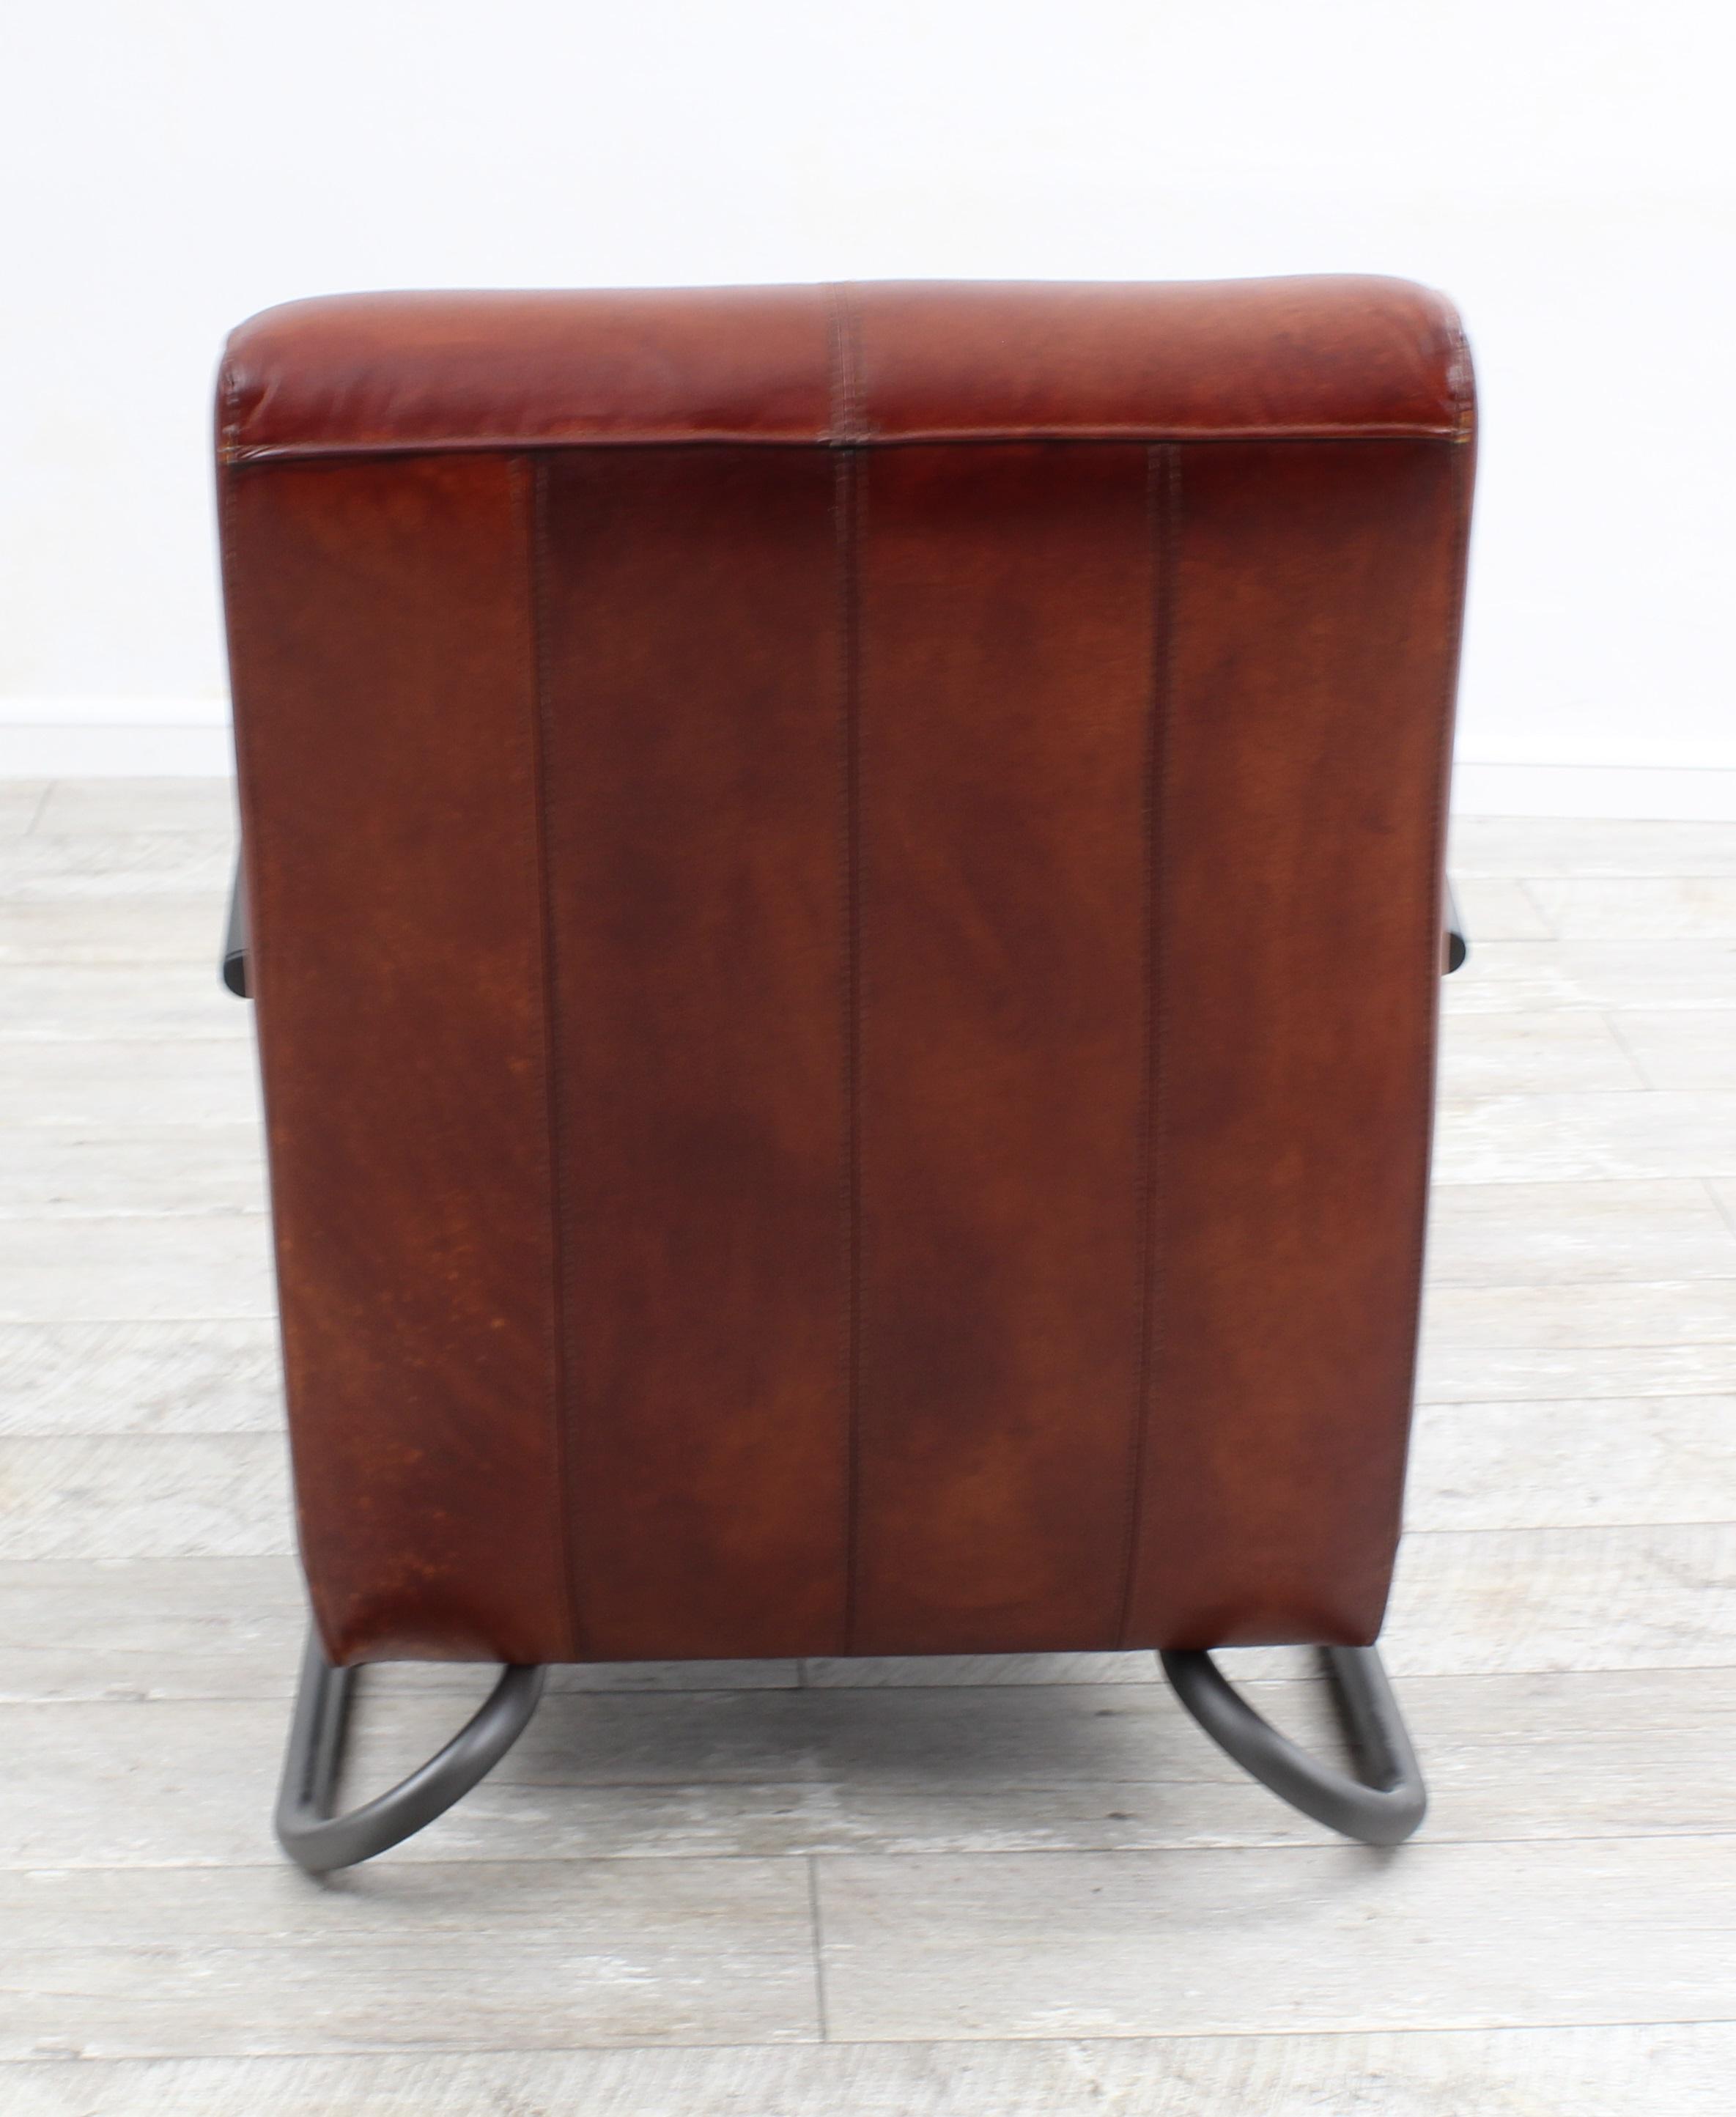 Aktiv Moebel De Sessel Stuhl Designer Munchen Nr 2 Echt Buffel Leder Vintage Farbe Dark Cognac Metall Fuss